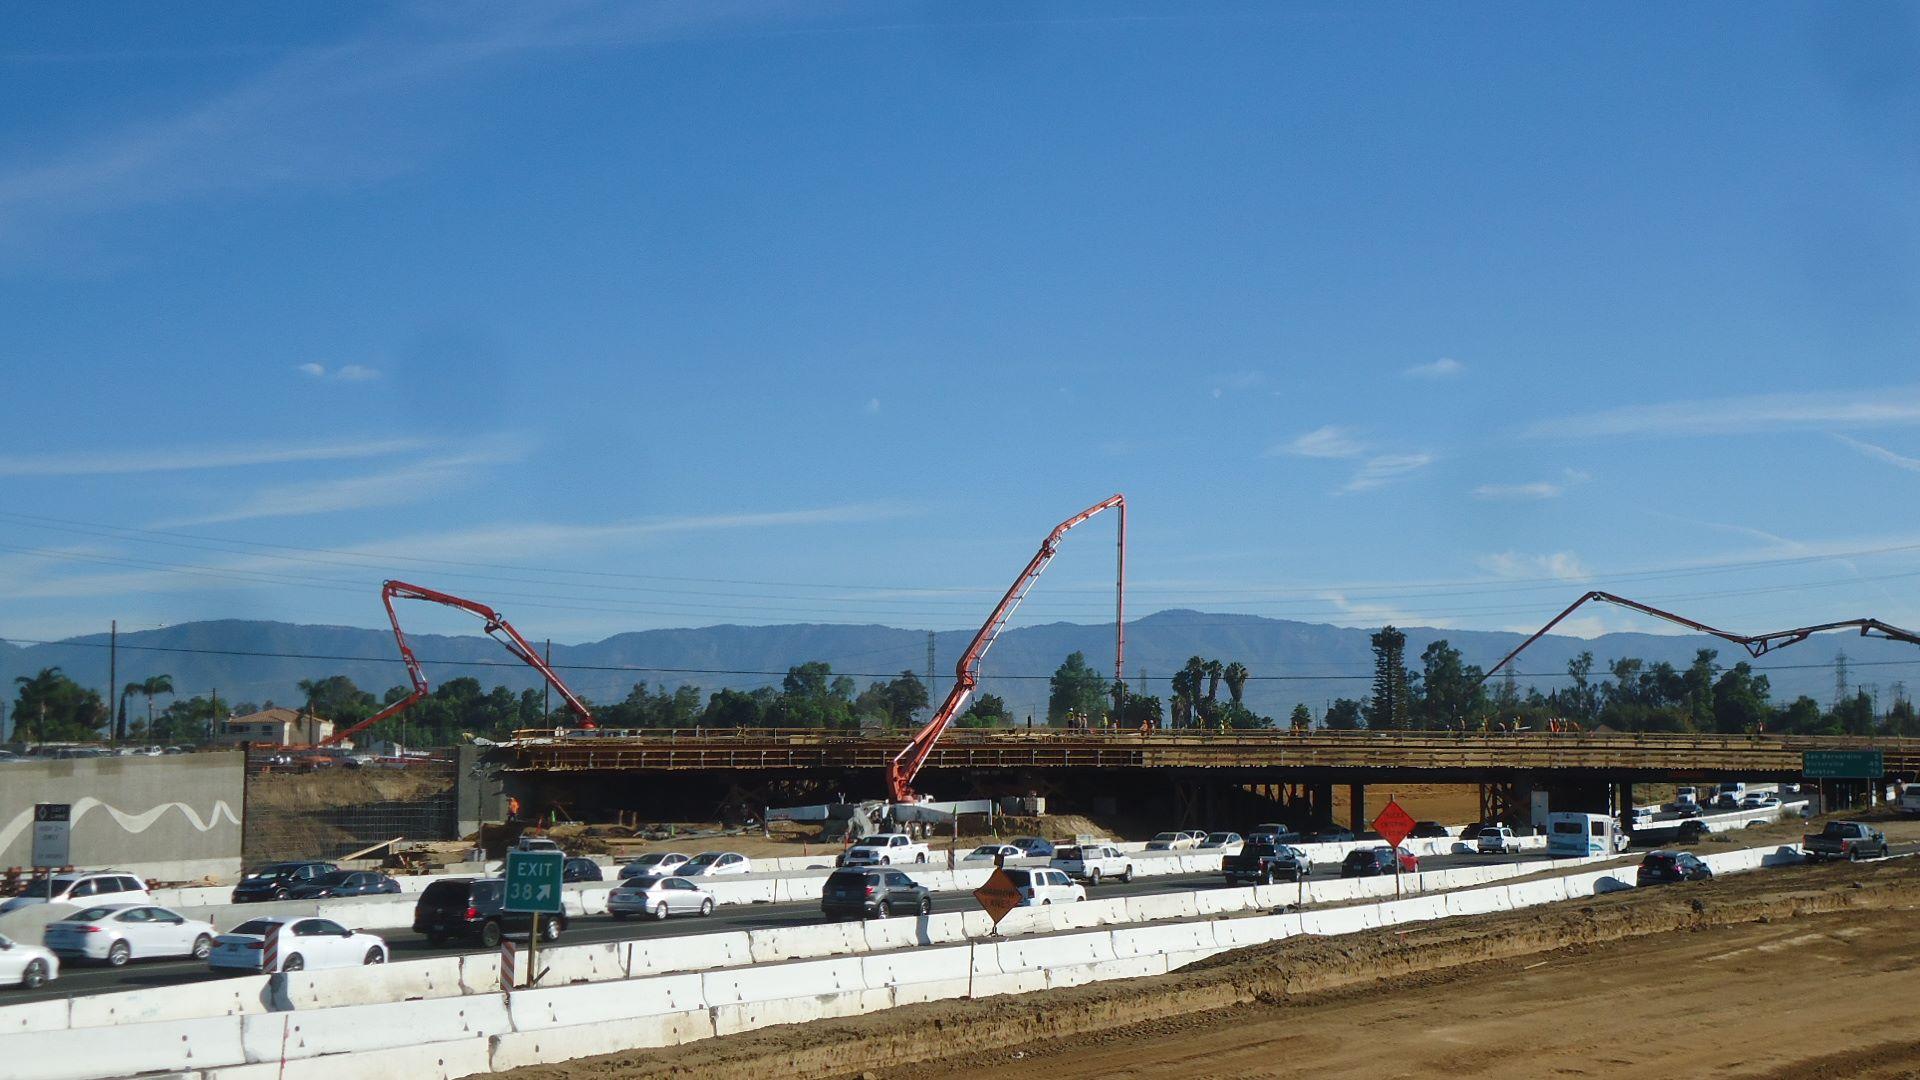 Upcoming night closures of I-215 freeway near San Bernardino